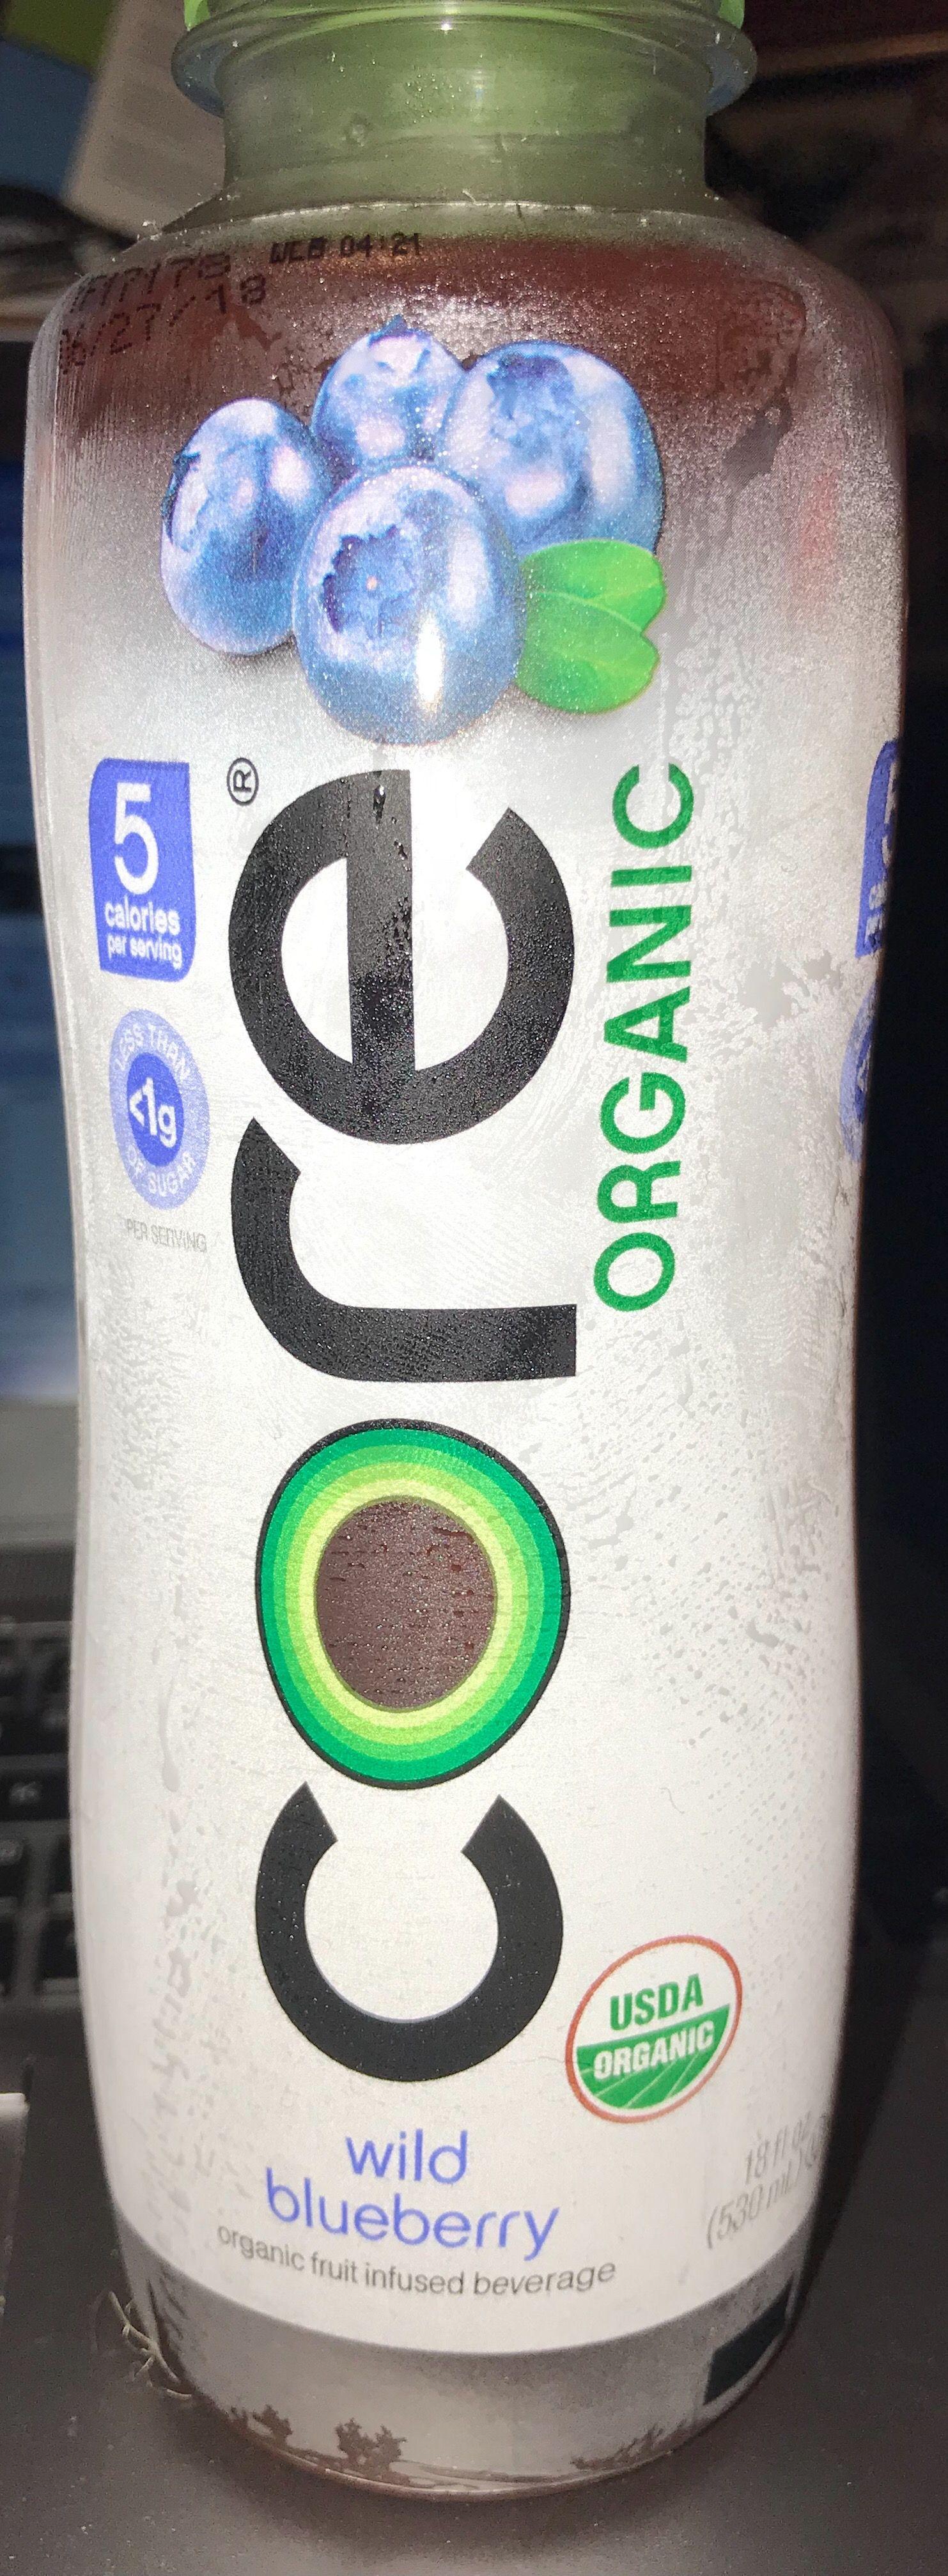 Core organic wild blueberry organic fruit infused beverage